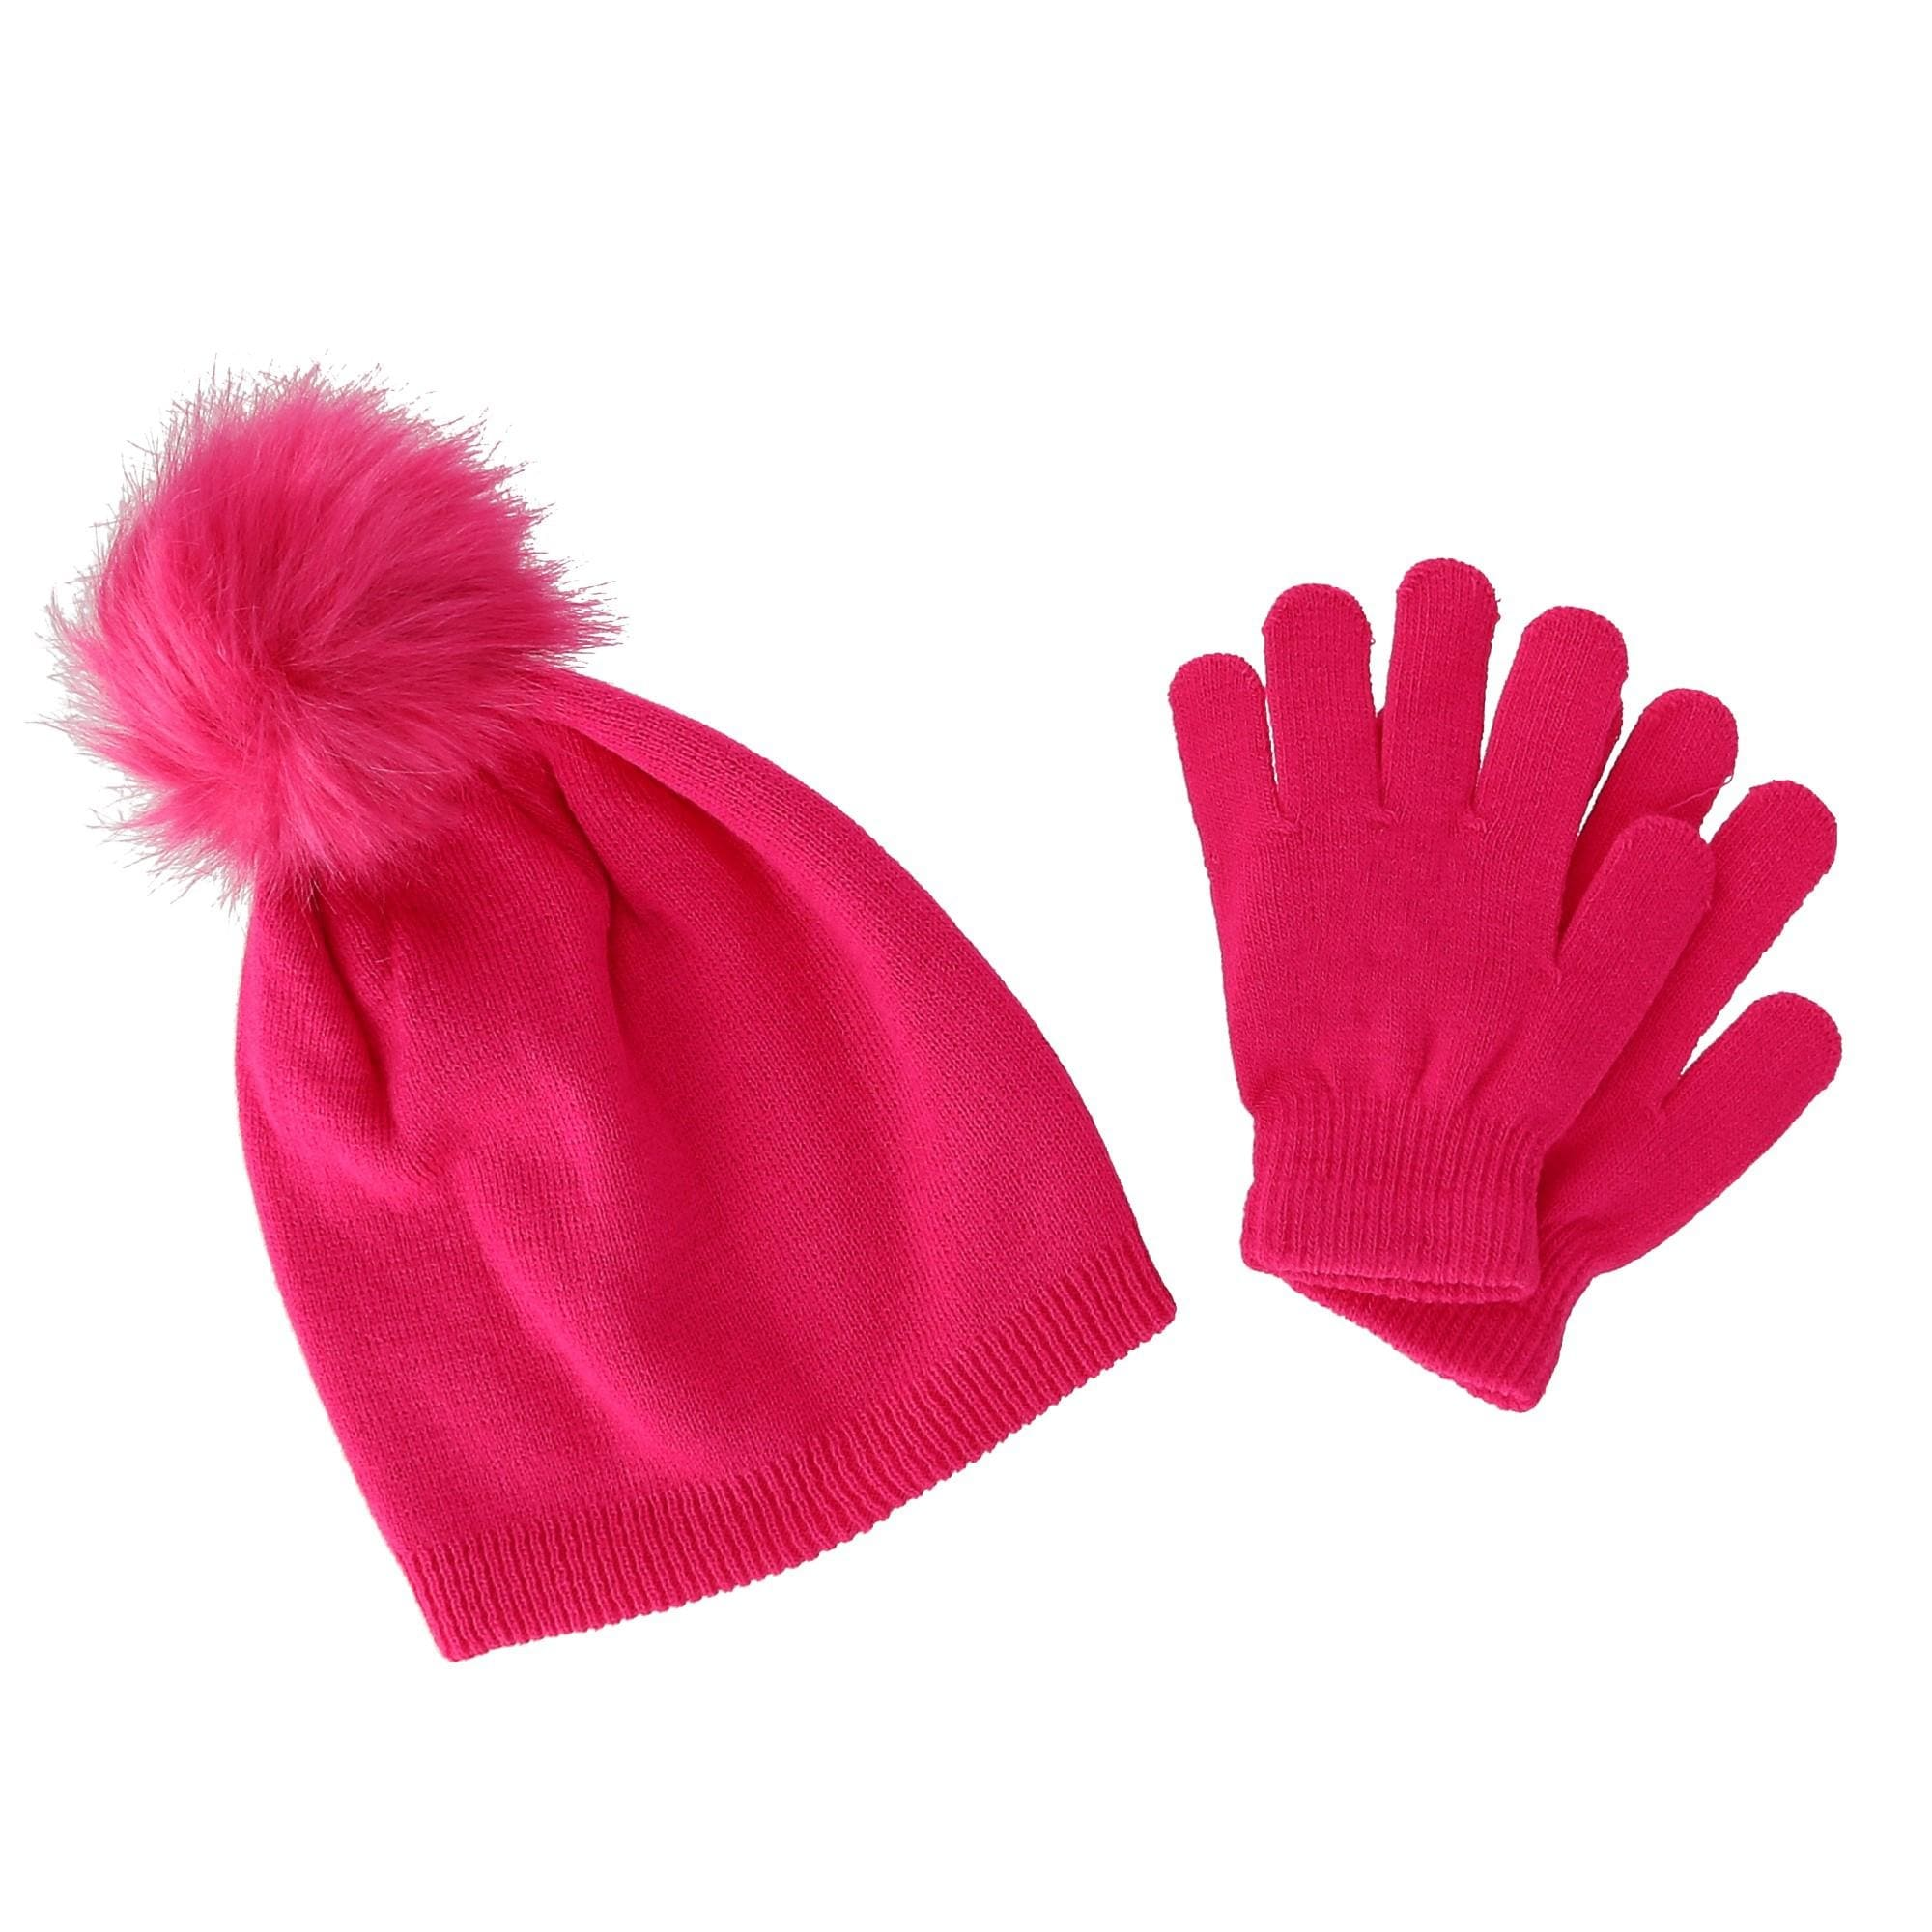 76e36248da1 Shop CTM® Girl s 7-14 Acrylic Beanie with Pom and Glove Set - Free ...